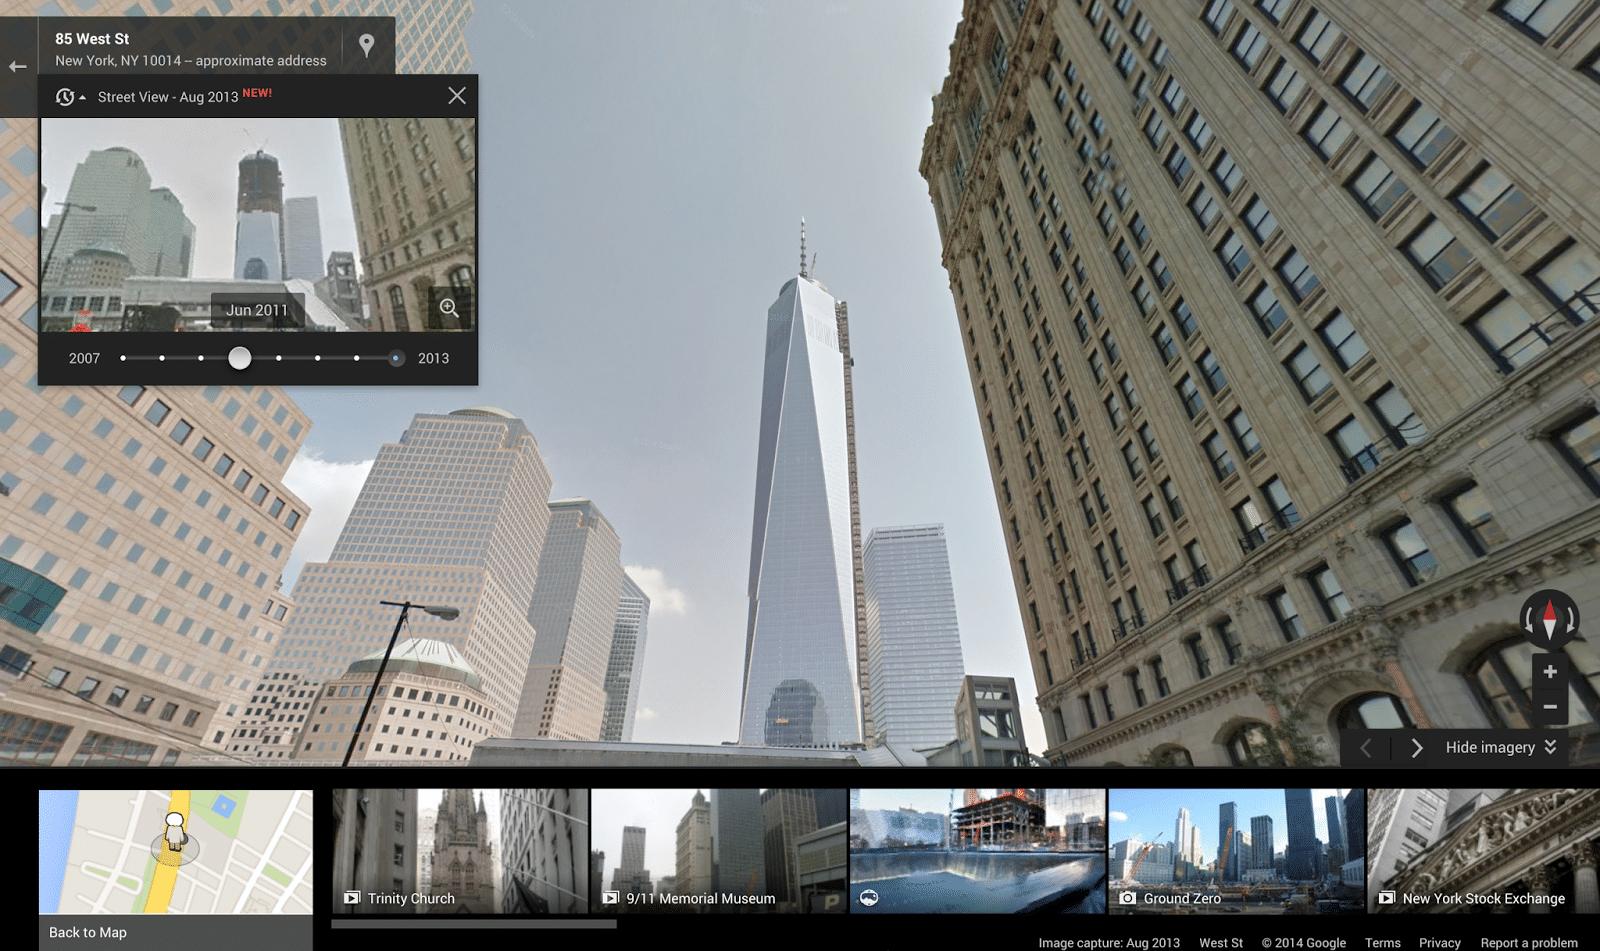 Google maps digital street view